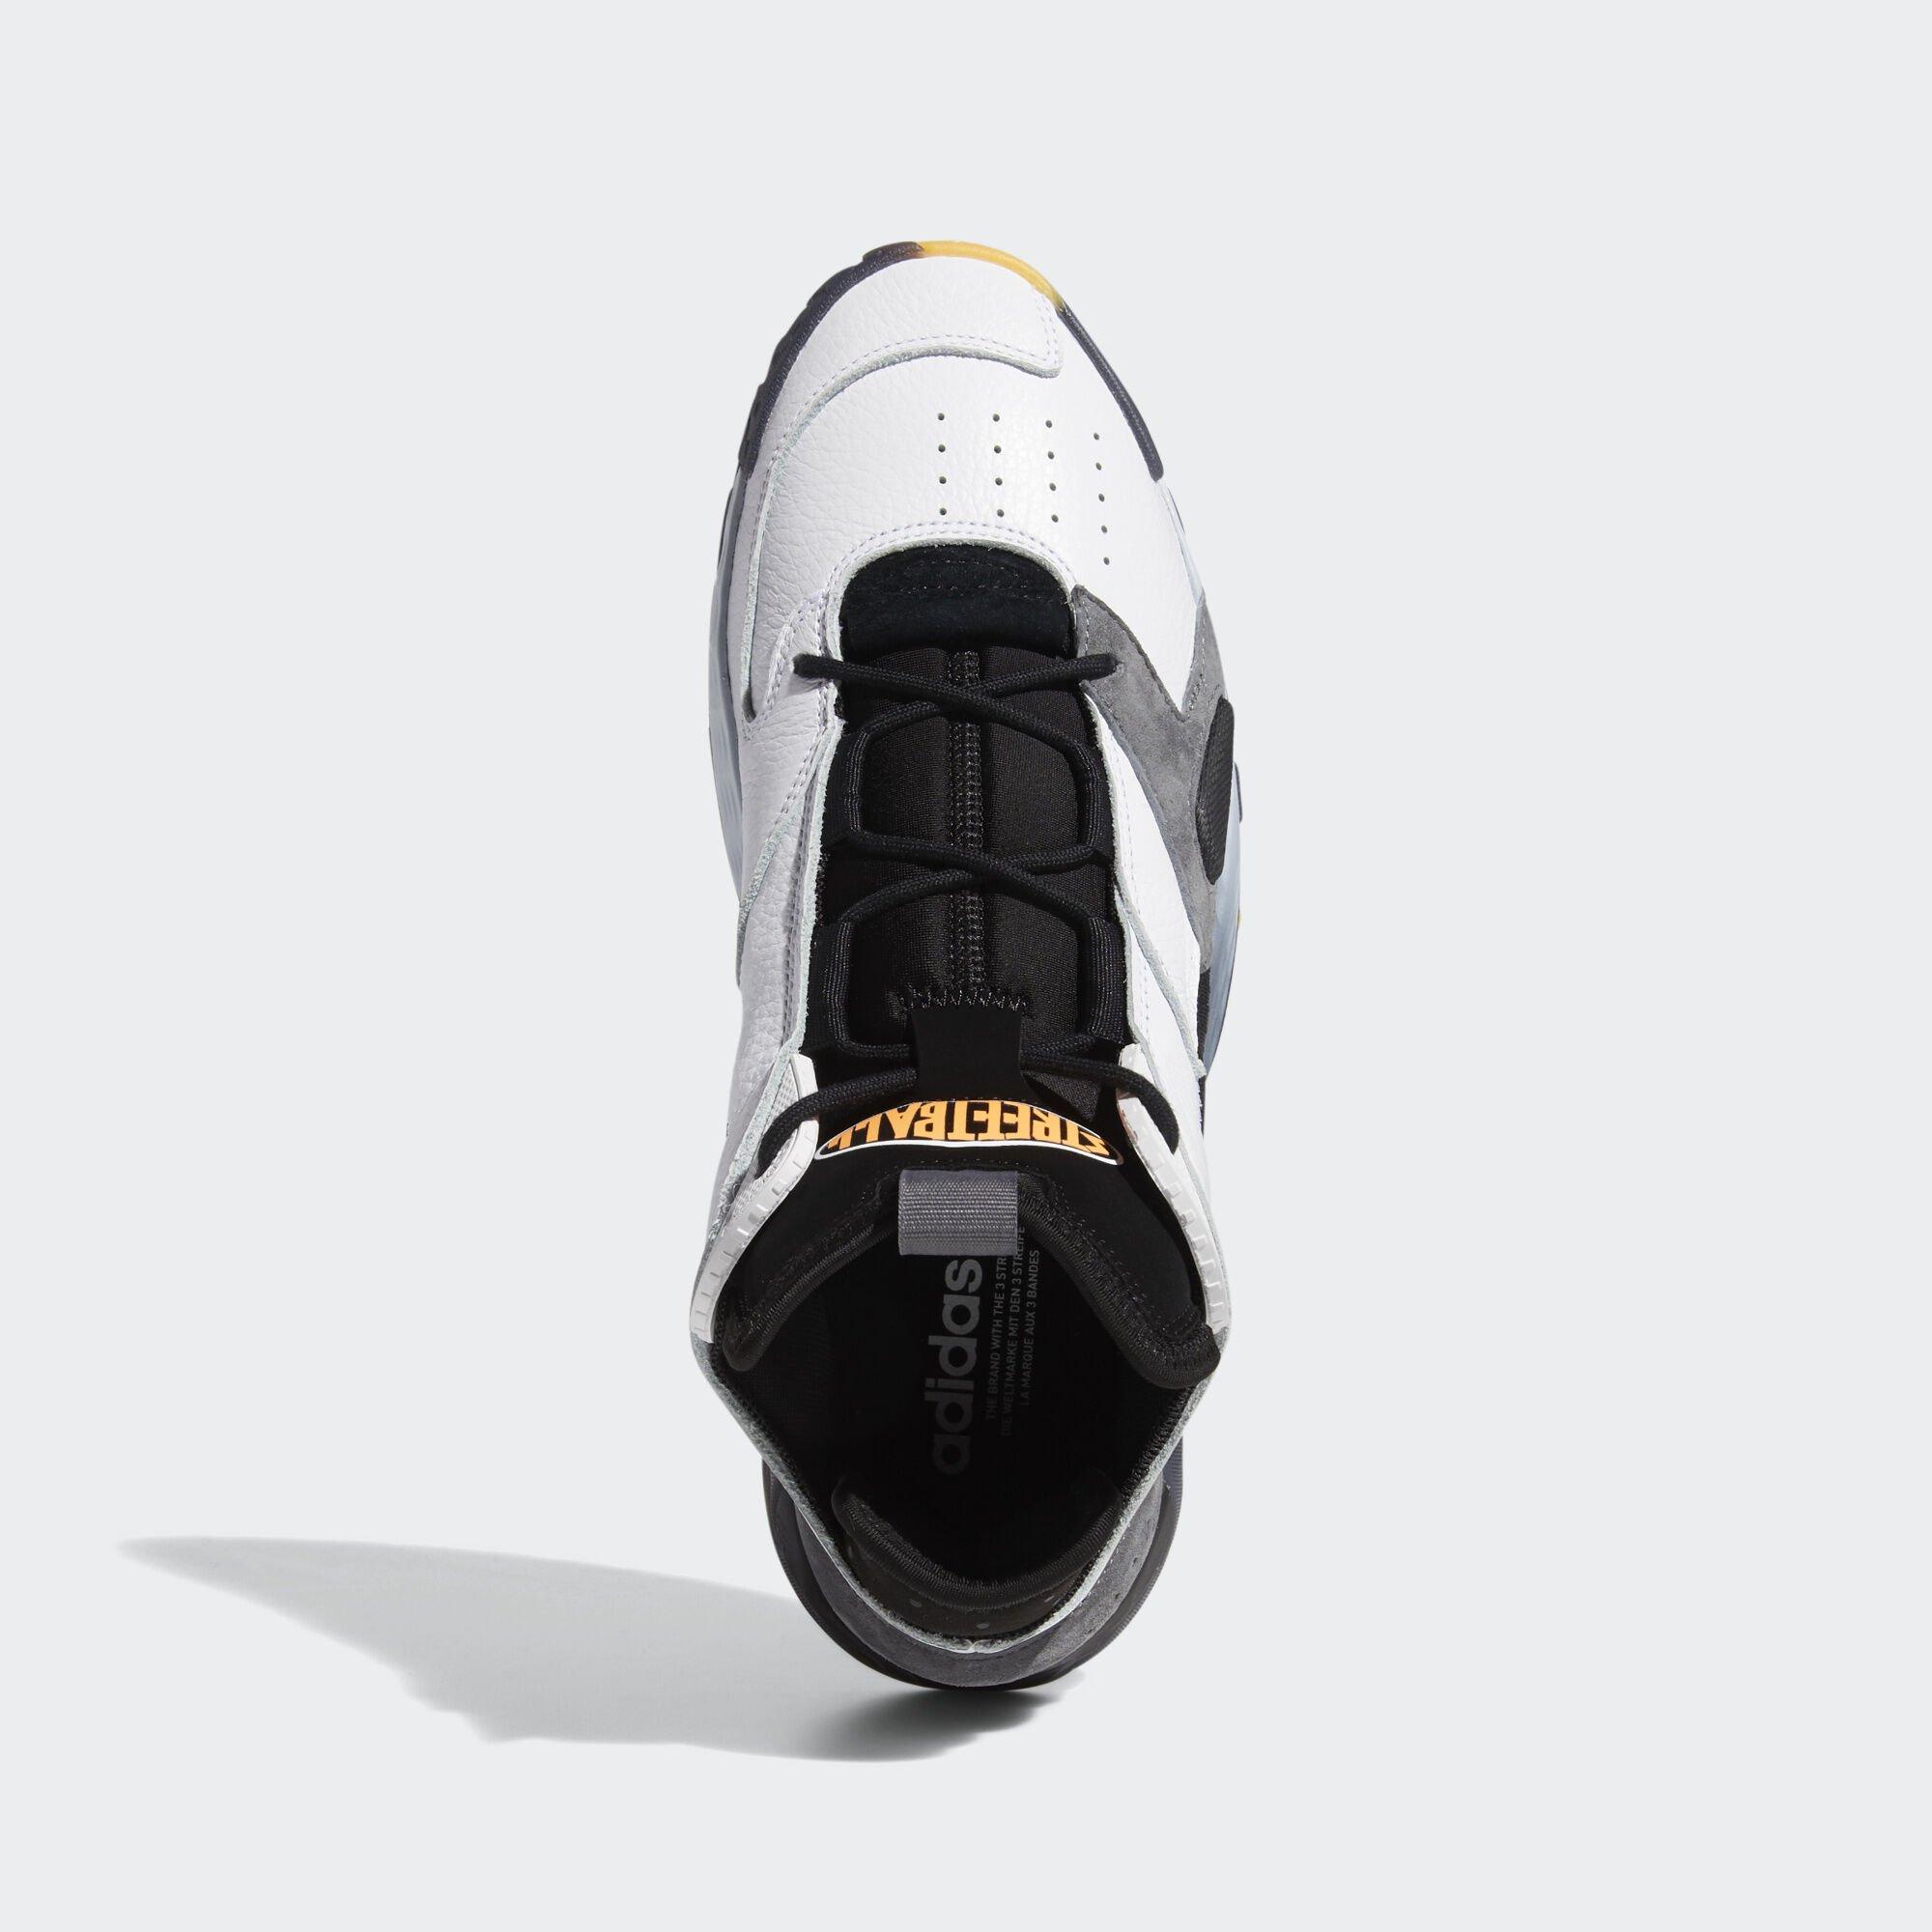 adidas Streetball White Black (EF9597)